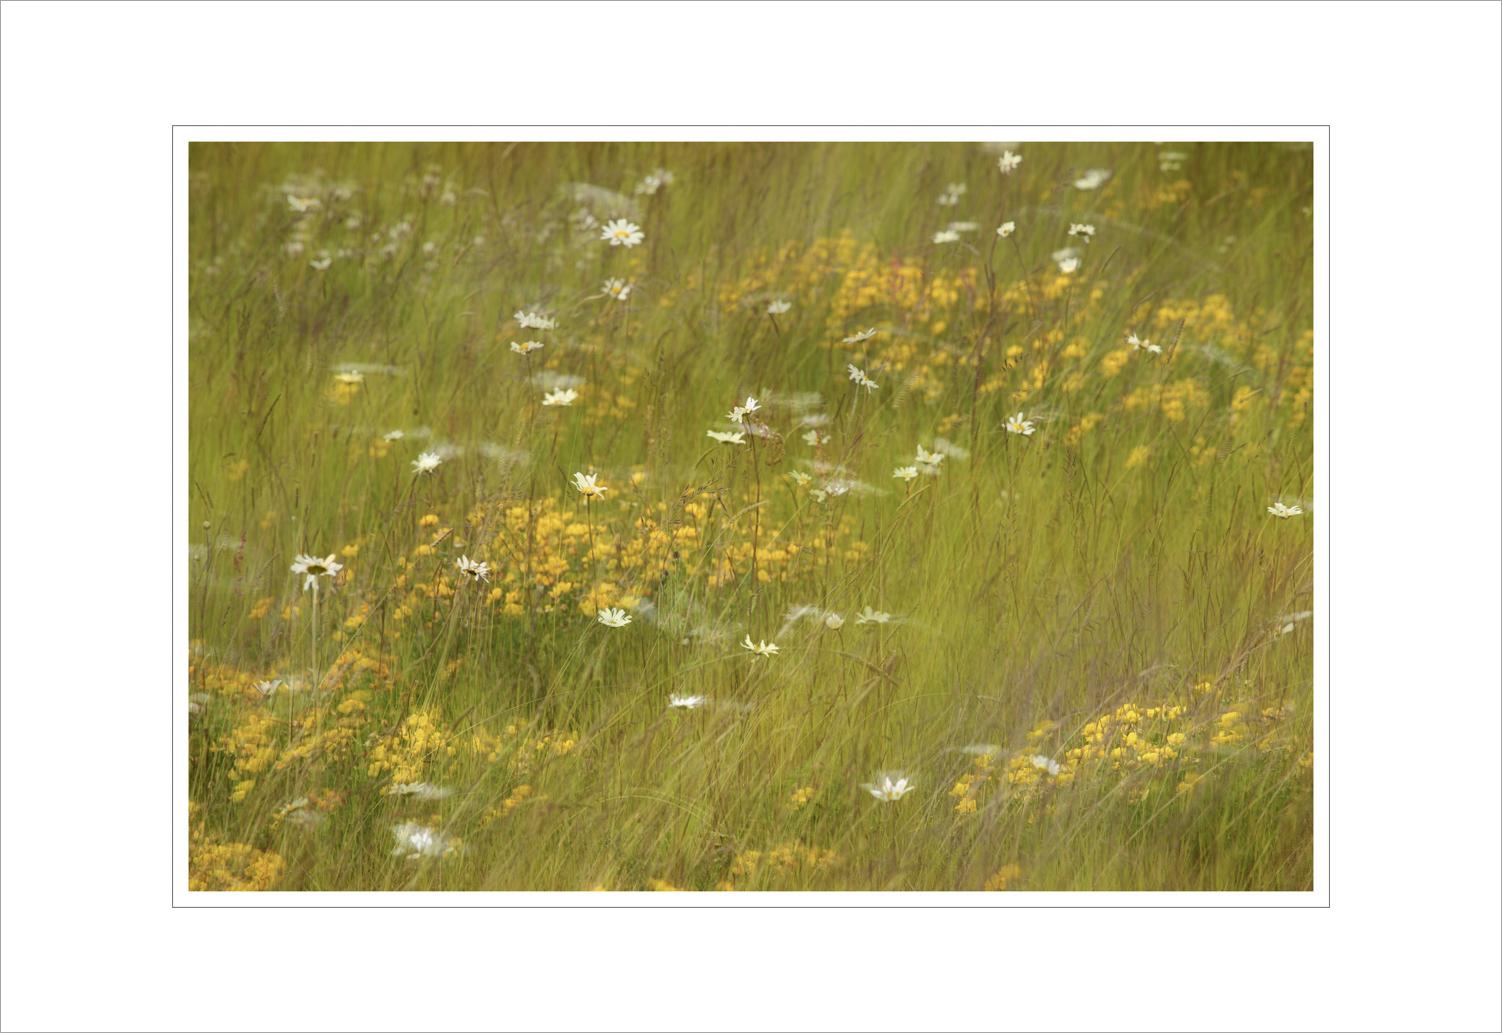 013 Swaying Wild Flower Meadow